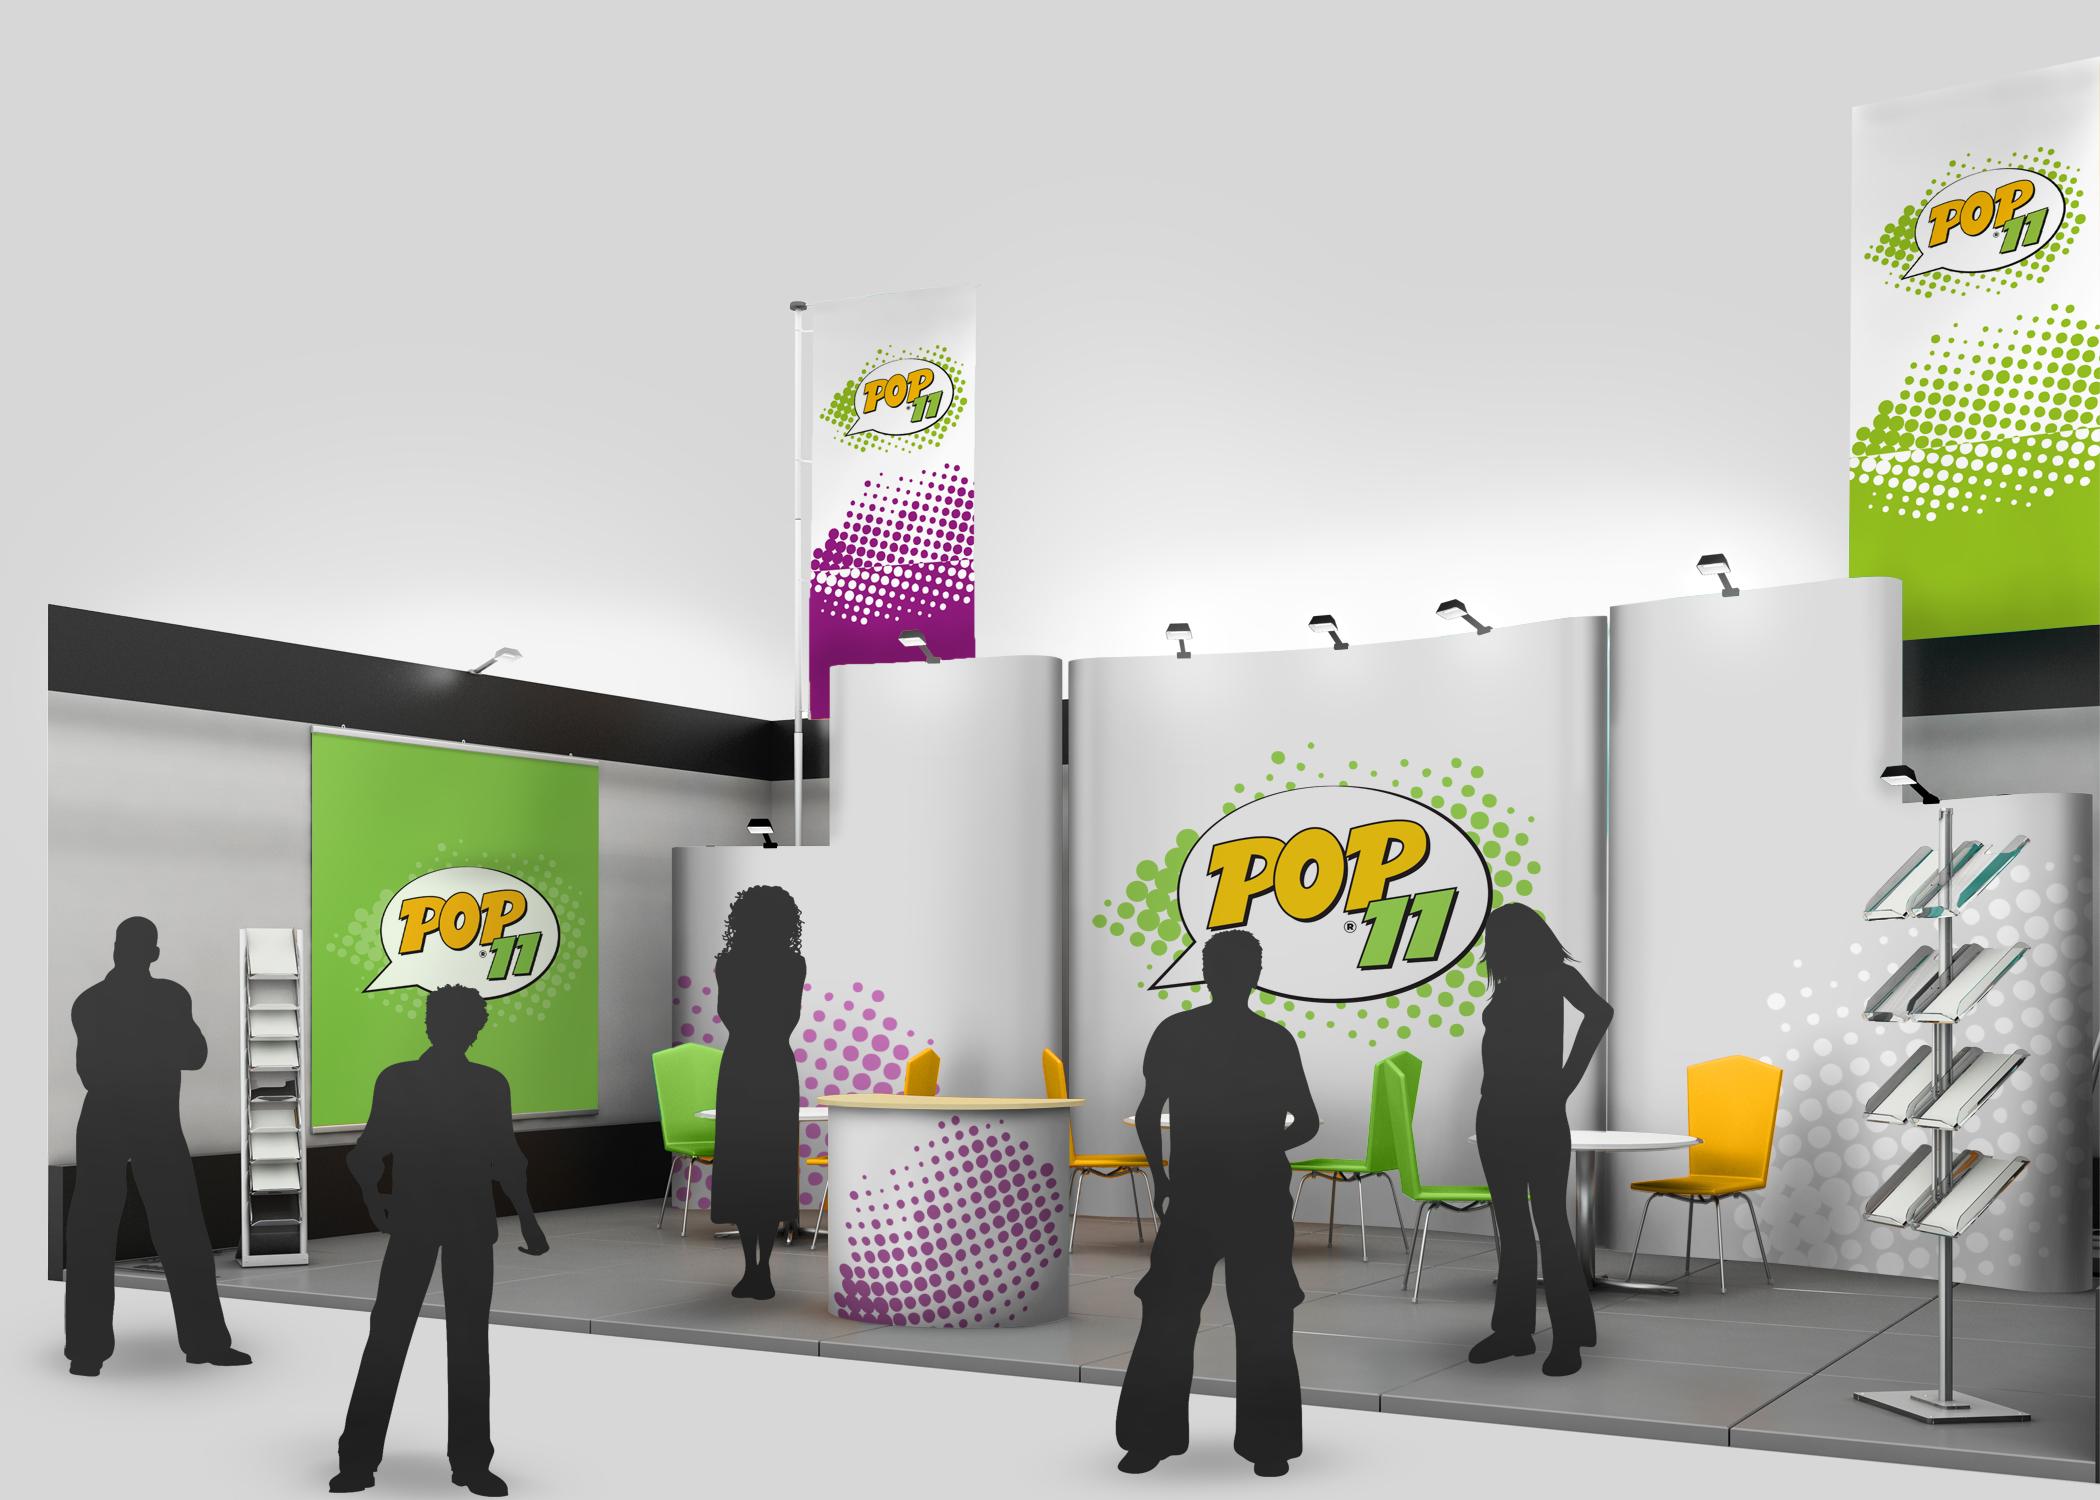 01 Event Pop11 Digital Prints